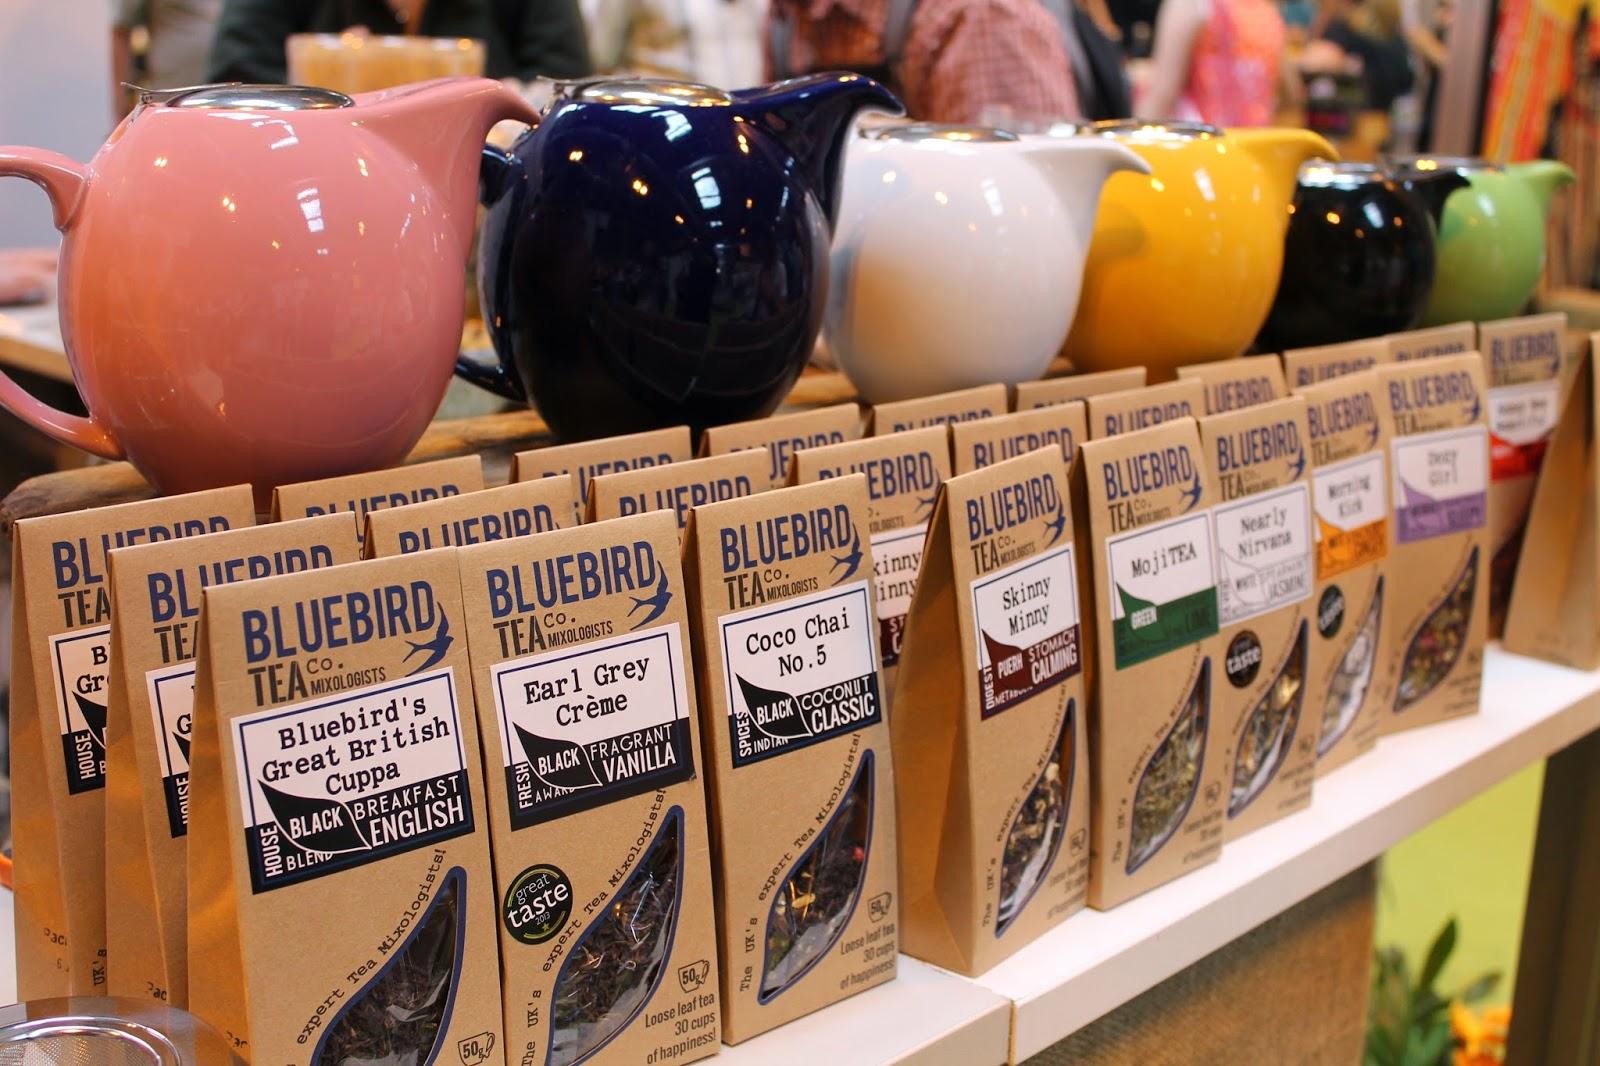 BBC Good Food Show Summer - NEC Birmingham - Bluebird Tea Co.